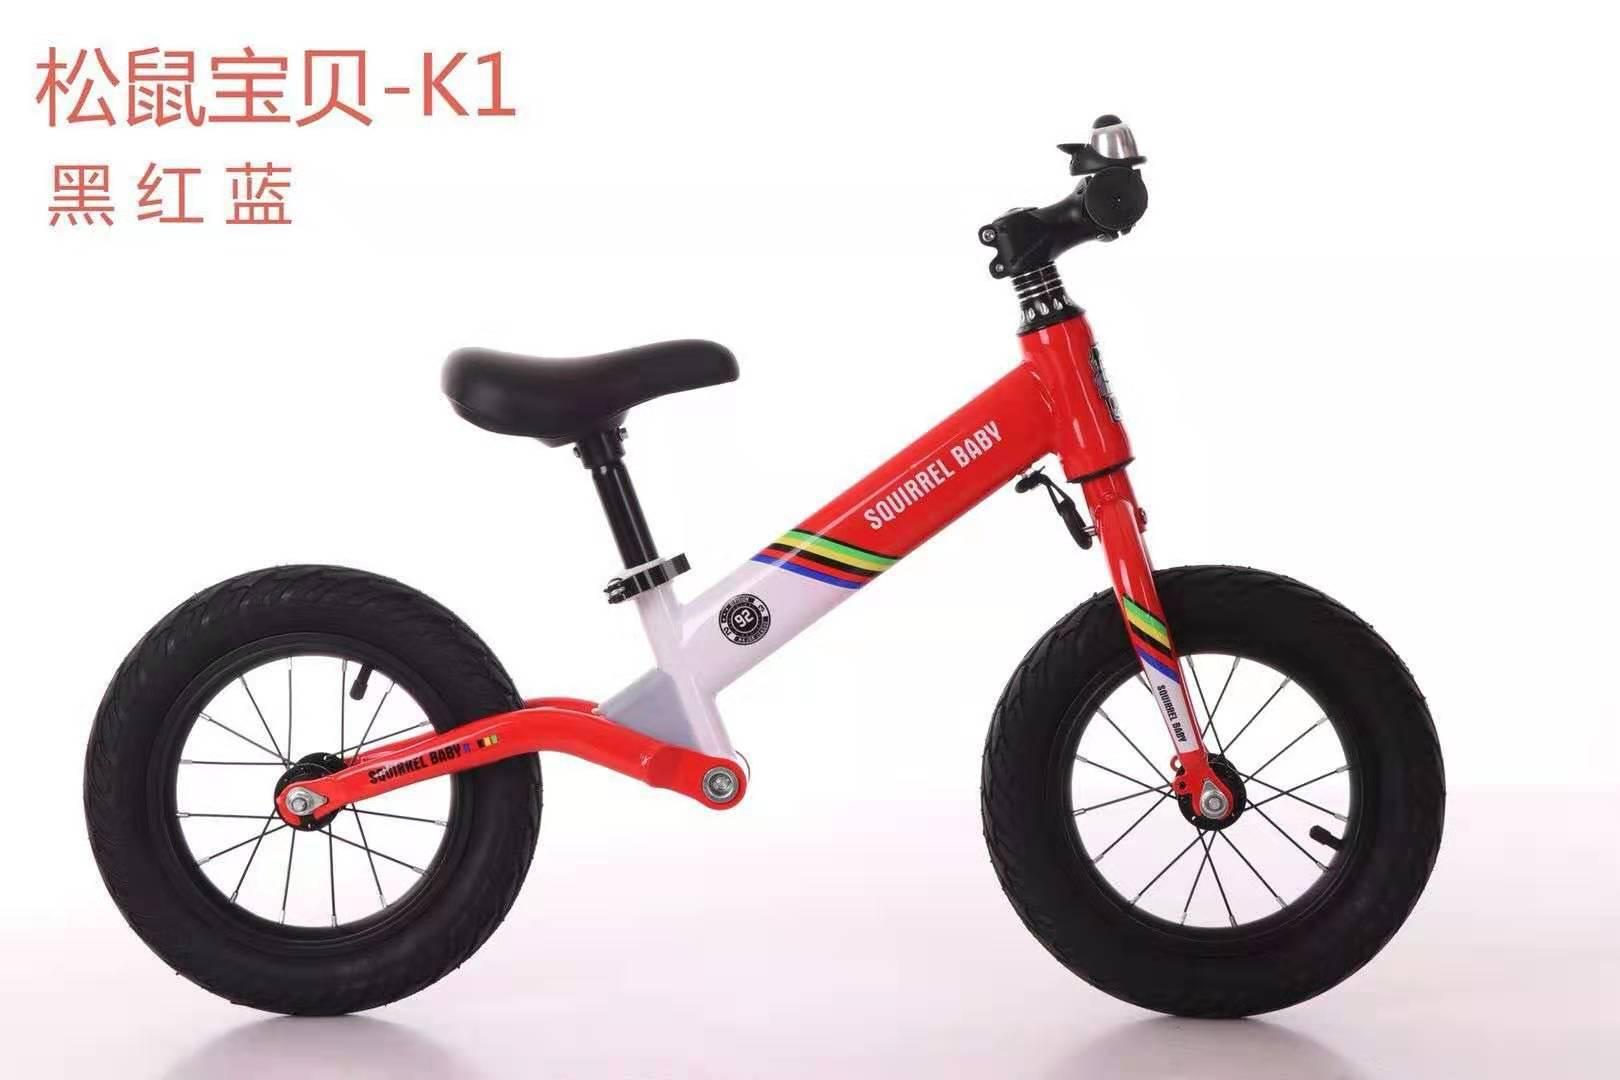 HTB1Jz1WeaSs3KVjSZPiq6AsiVXam Children balance bike without pedal slide baby damper sliding kids bicycle self balance scooters racing